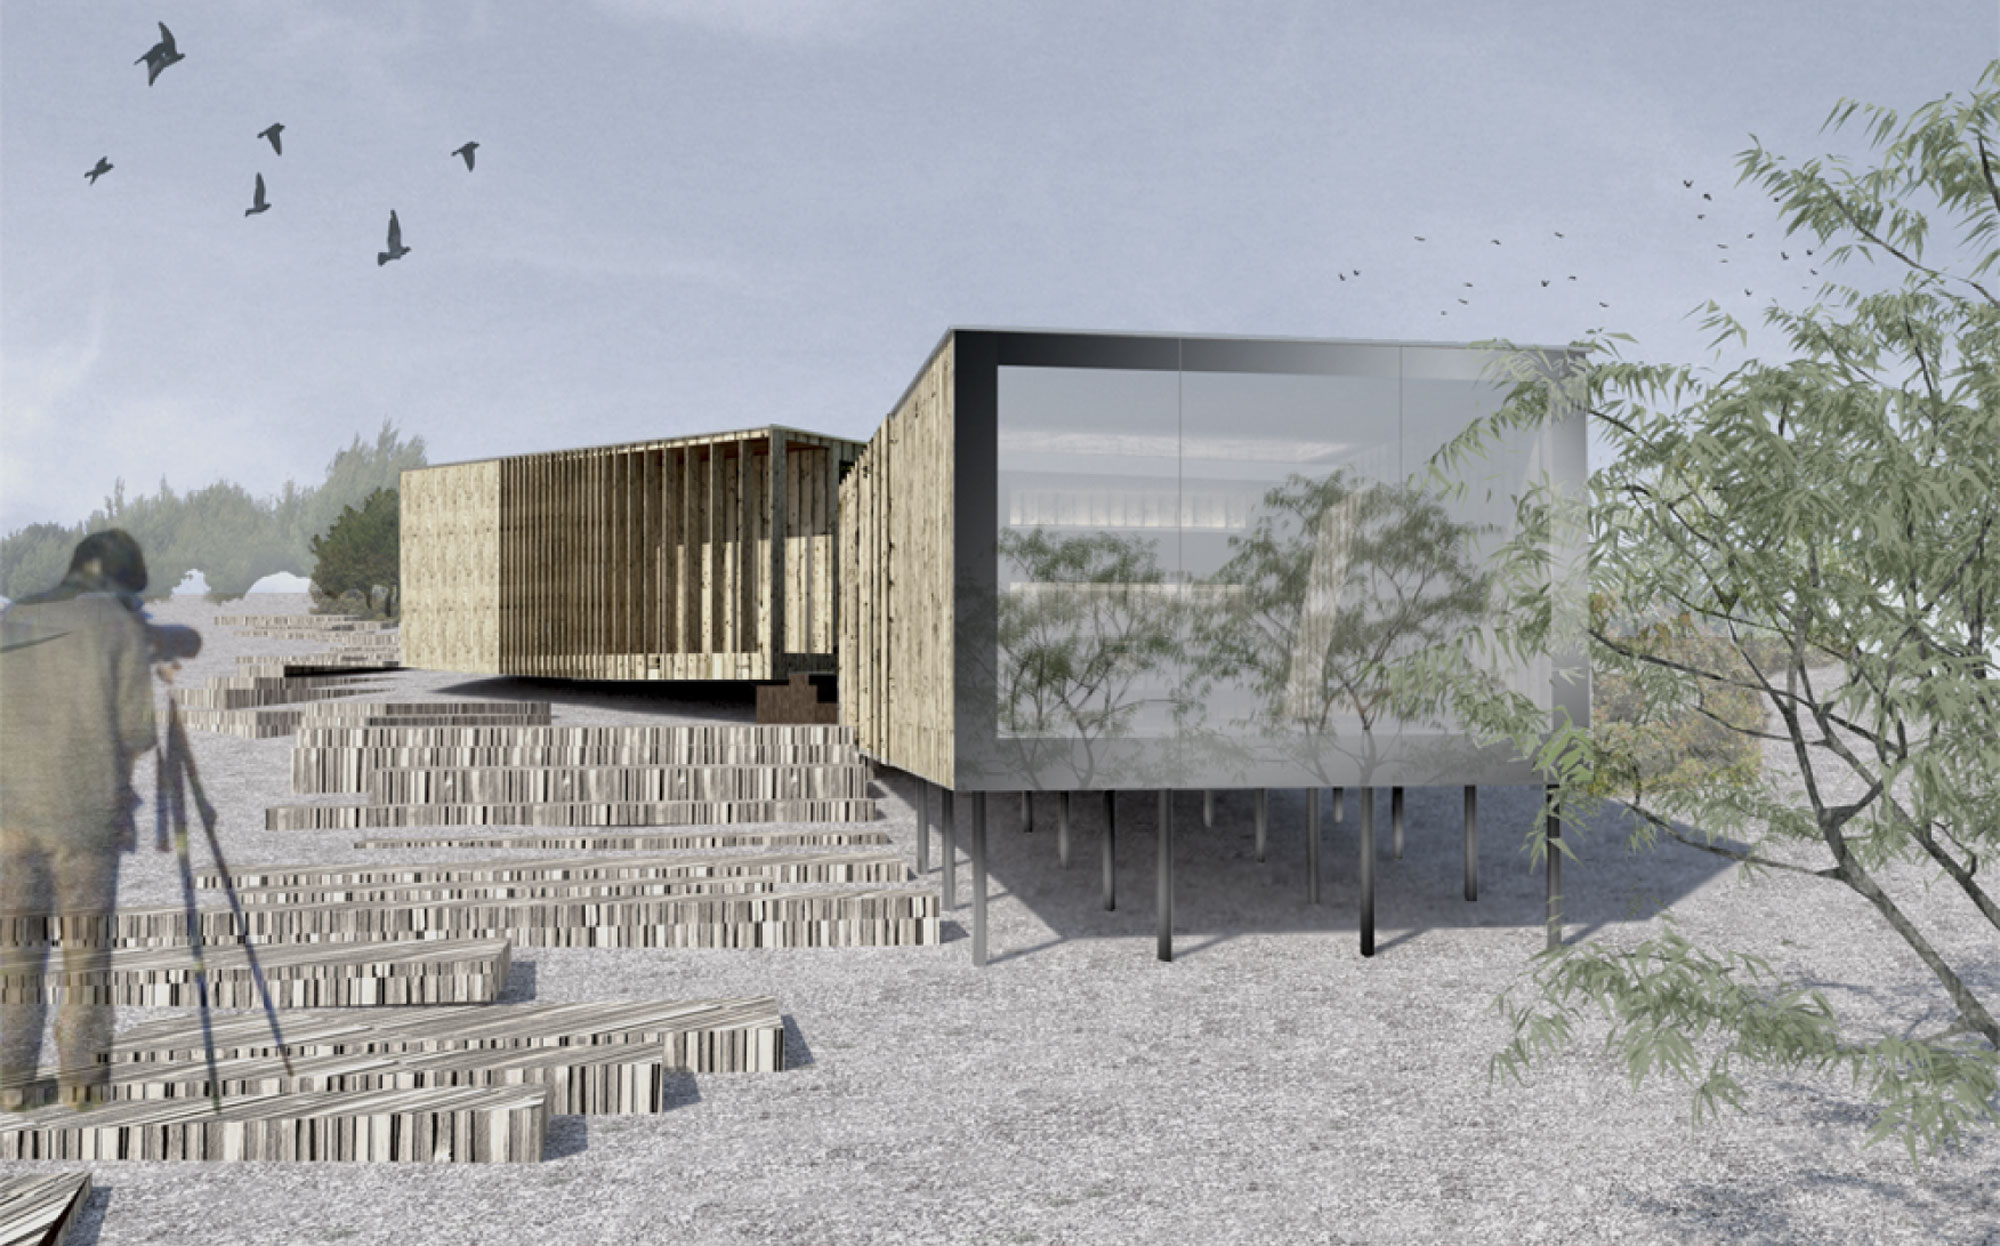 Projecto de Arquitectura Observatório de Aves | Arquitectura, Arquitecto Lisboa, Projecto arquitectura Lisboa, Arquitecto Lisboa, Arquitecto, Gabinete de Arquitetura Lisboa